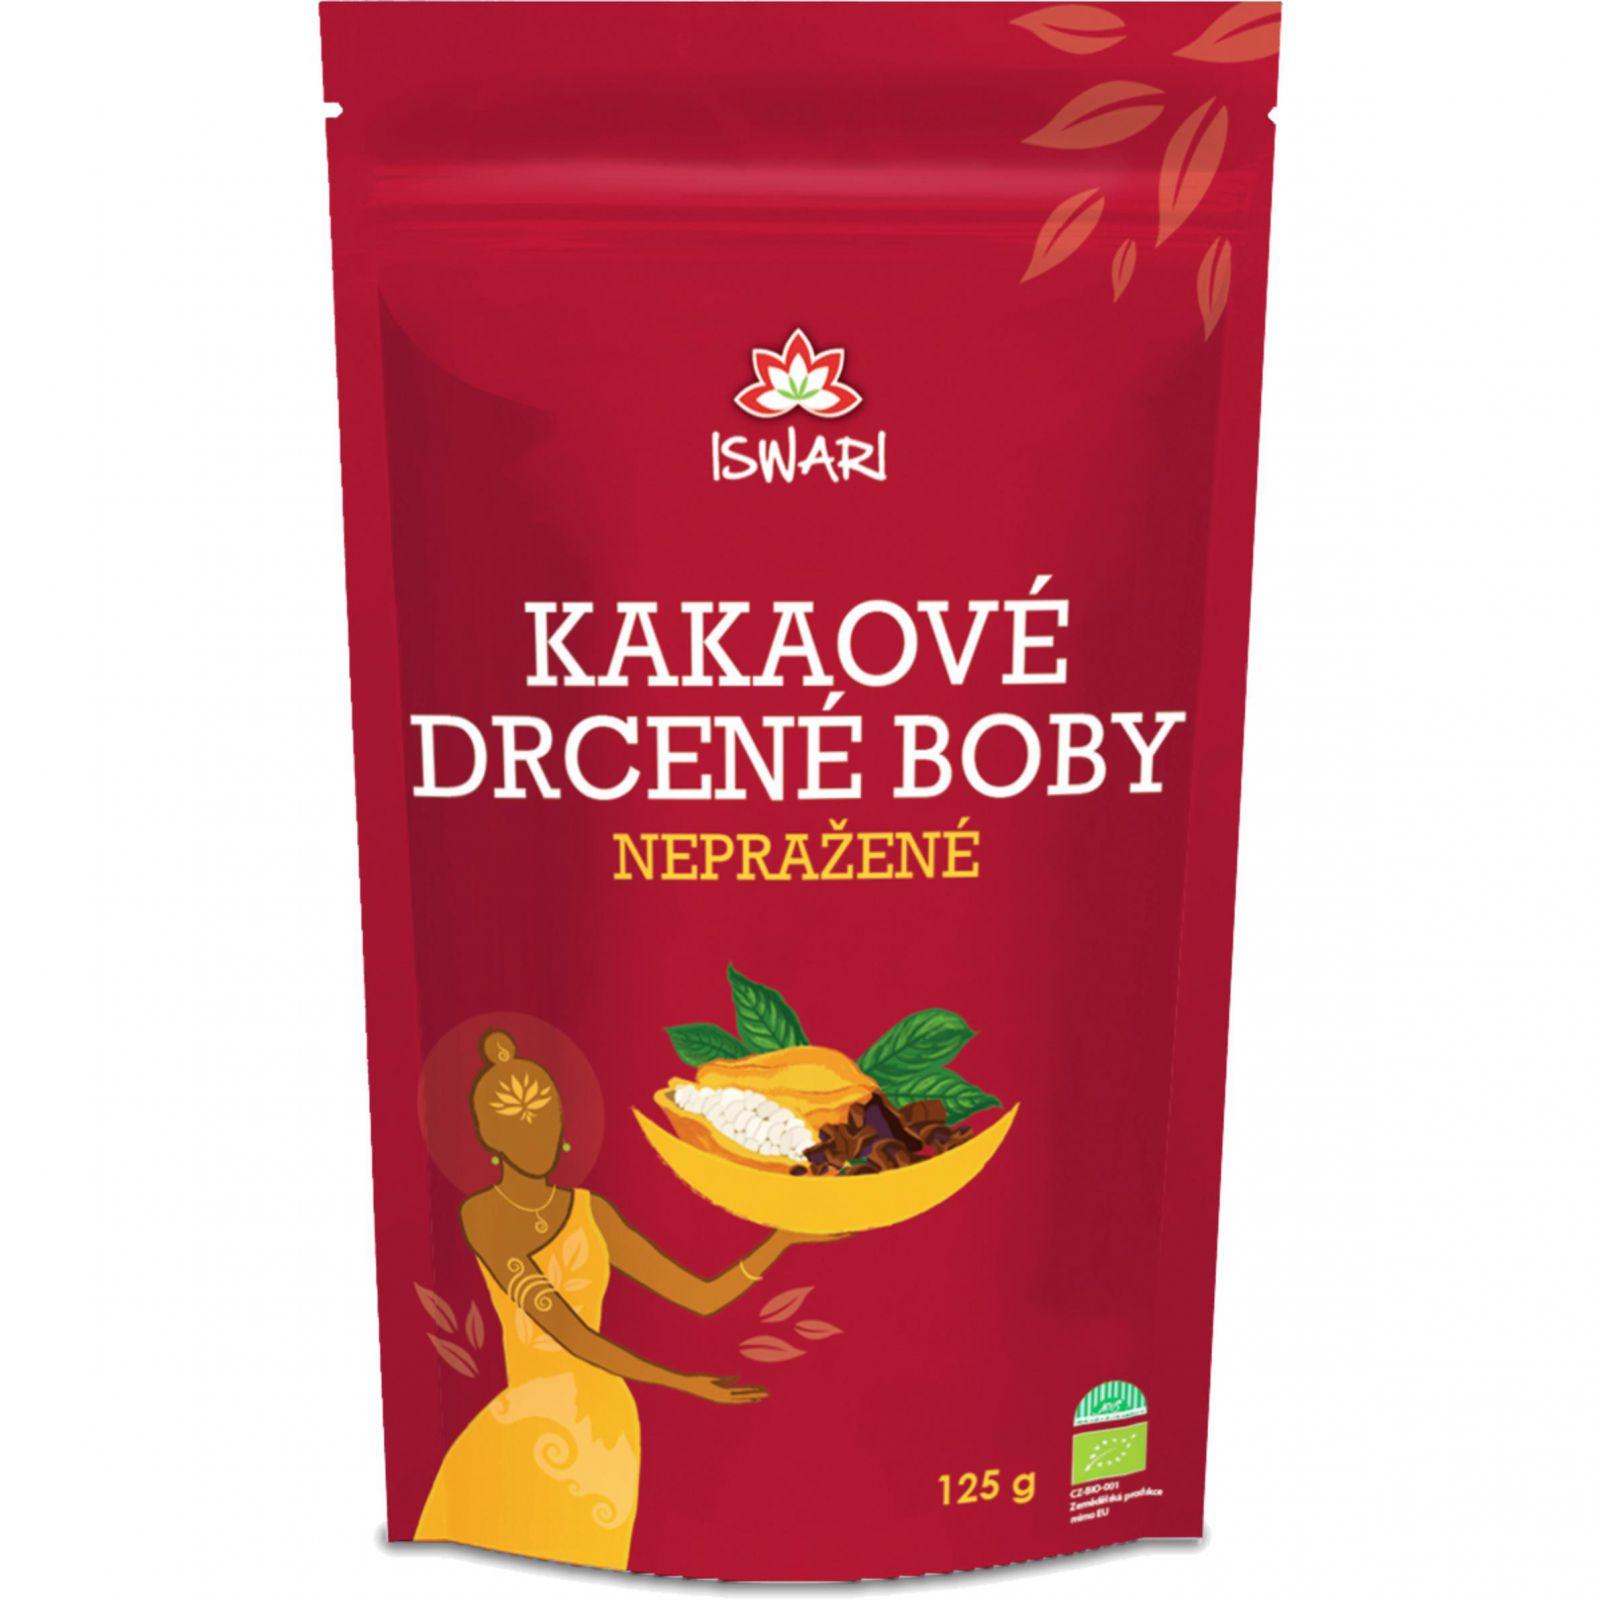 Iswari nepražené kakao - drcené boby 125 g